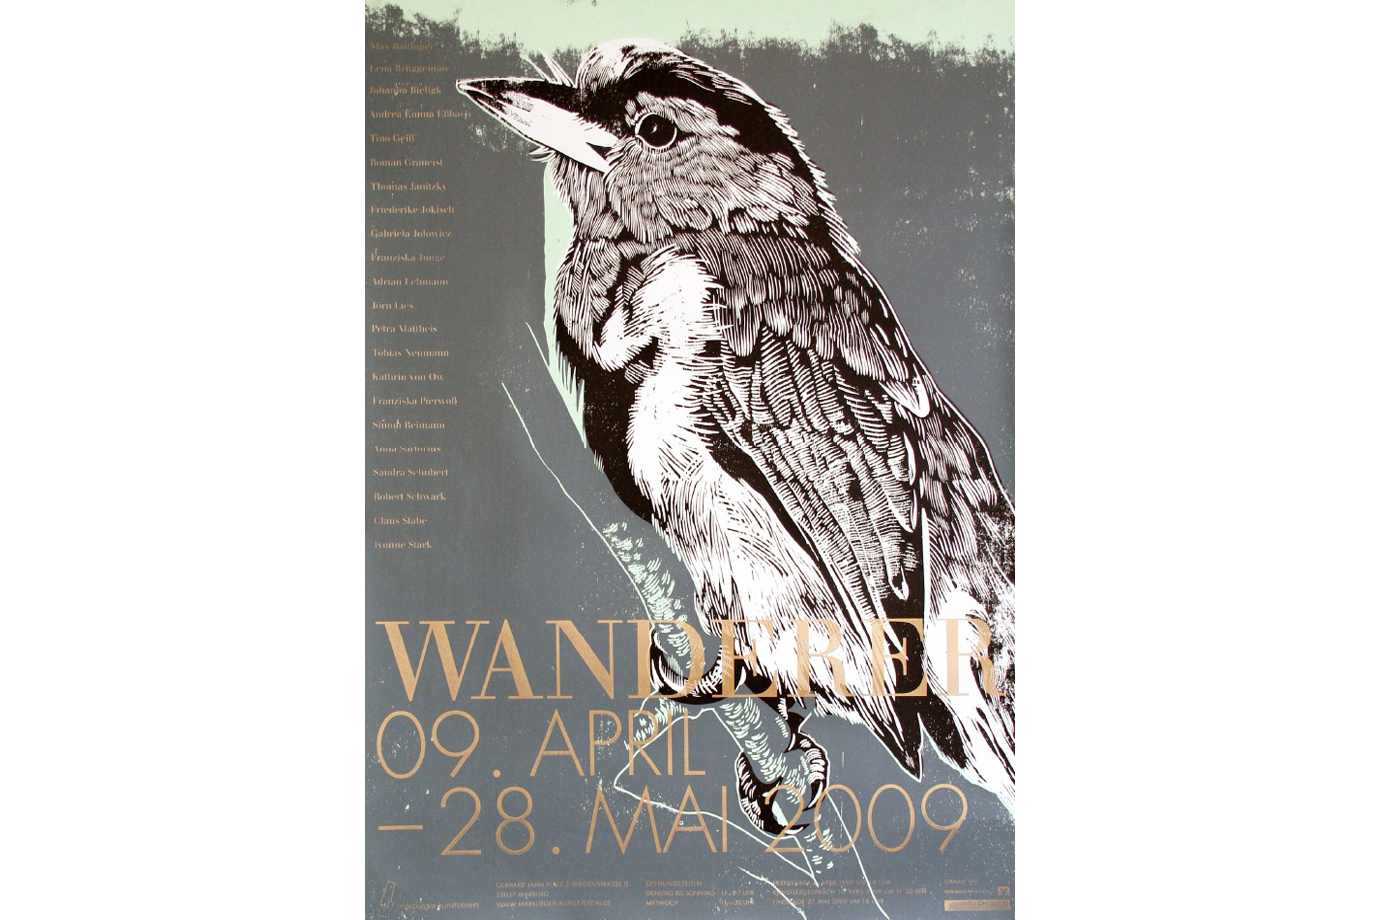 http://e-o-t.de/wordpress/wp-content/uploads/2017/06/2009_eot-Wanderer-Poster-0.jpg